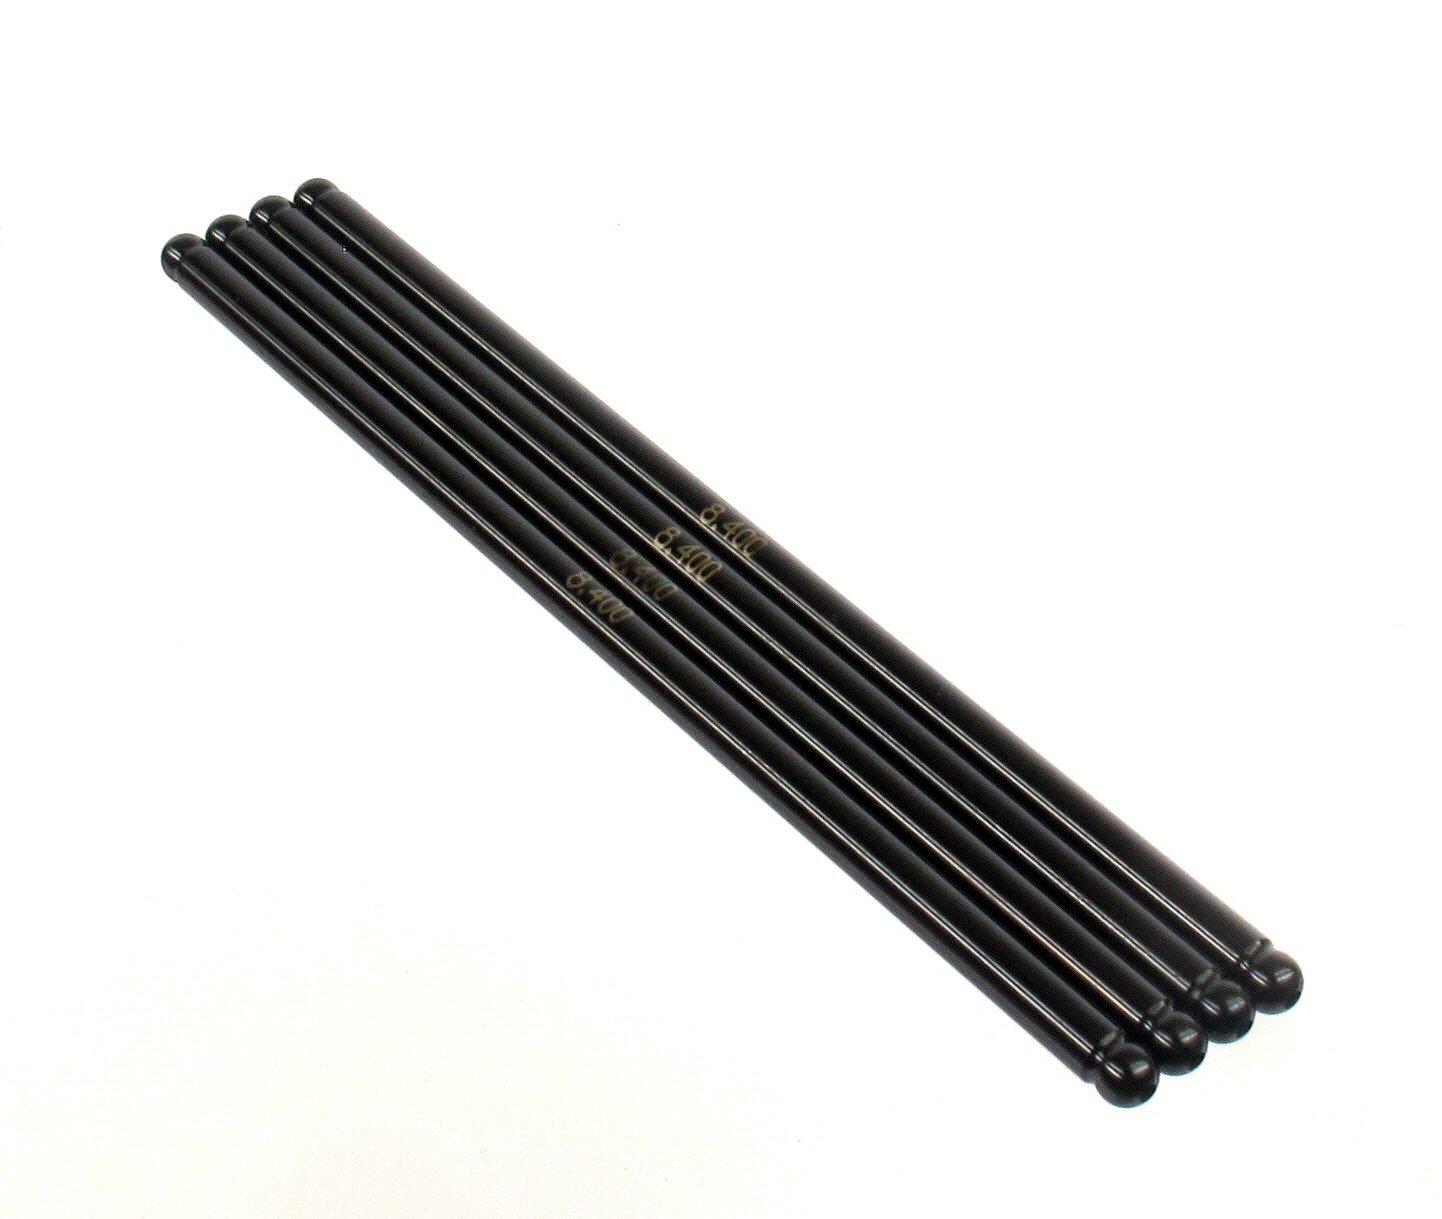 Elgin PR-15840Q4 High Performance Push Rod 4 Pack Box of 4